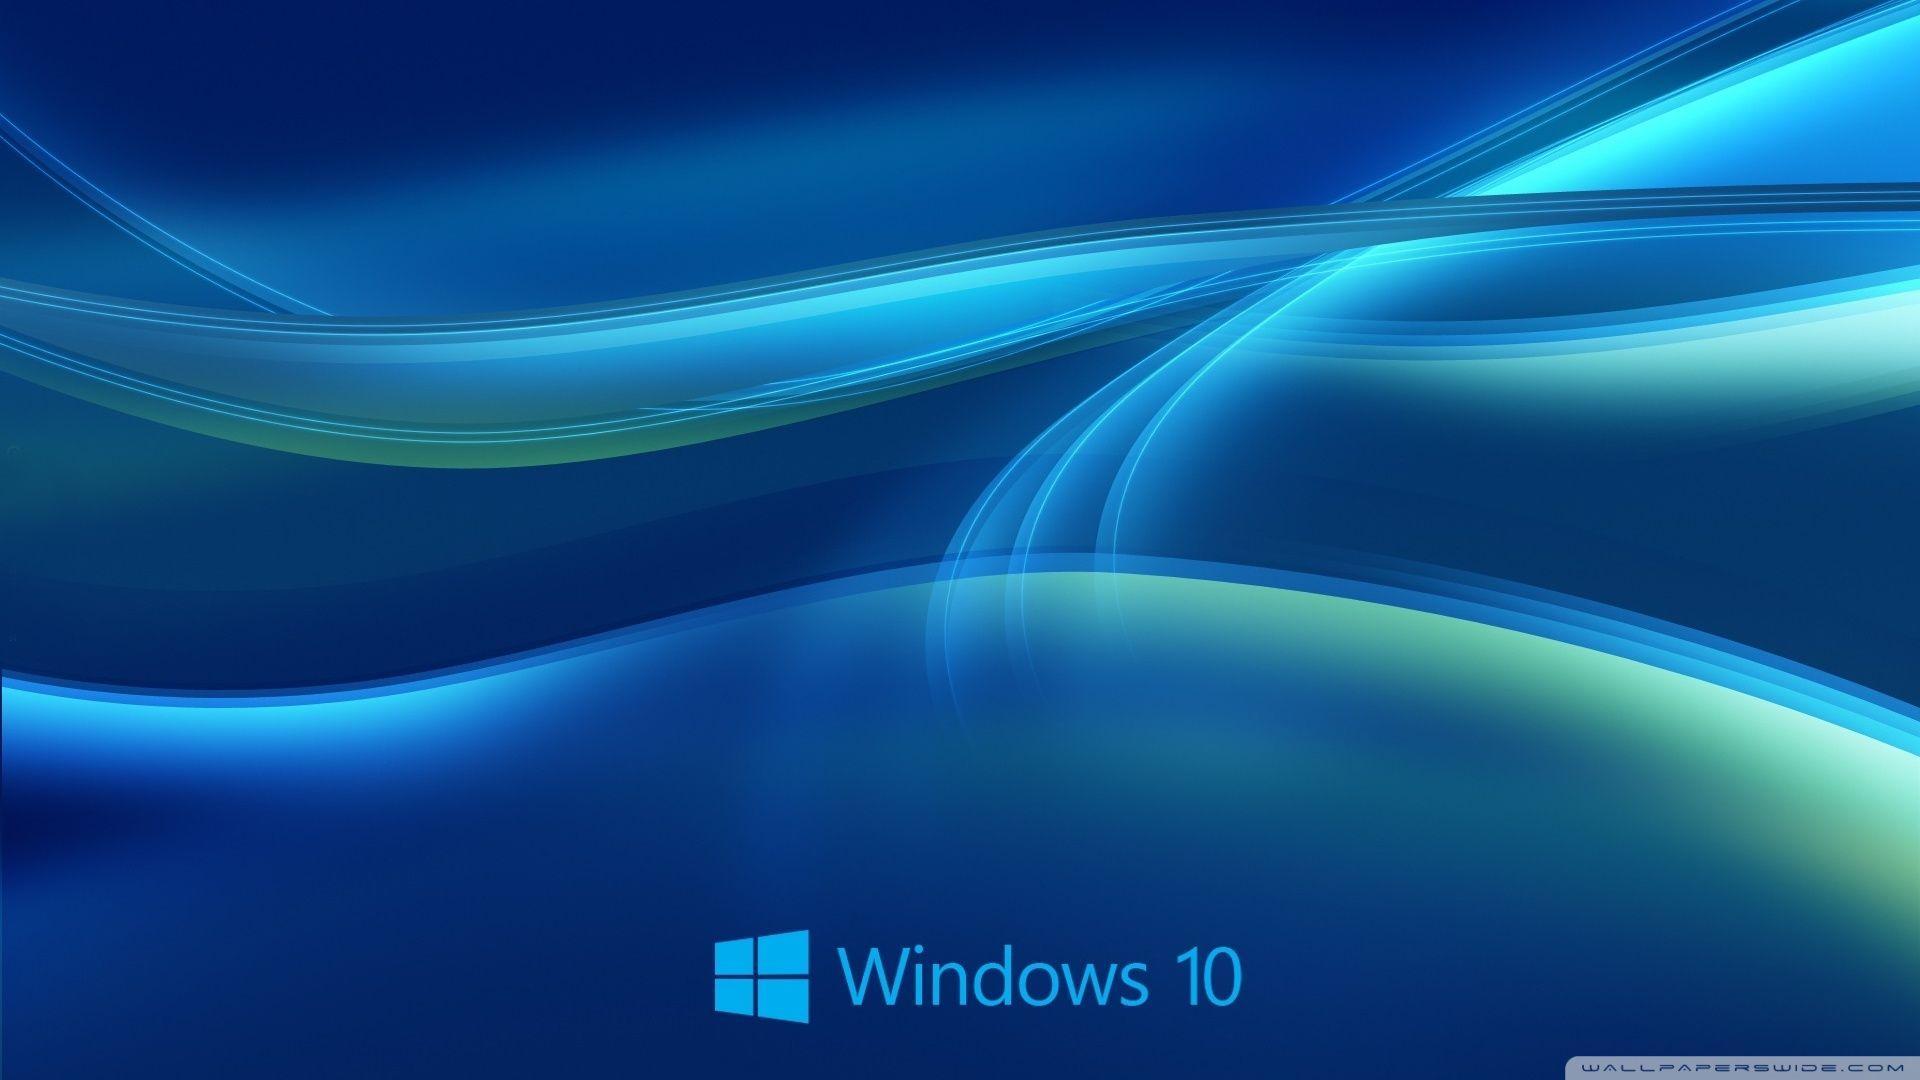 Windows 10 Hd Wallpapers Wallpaper Cave